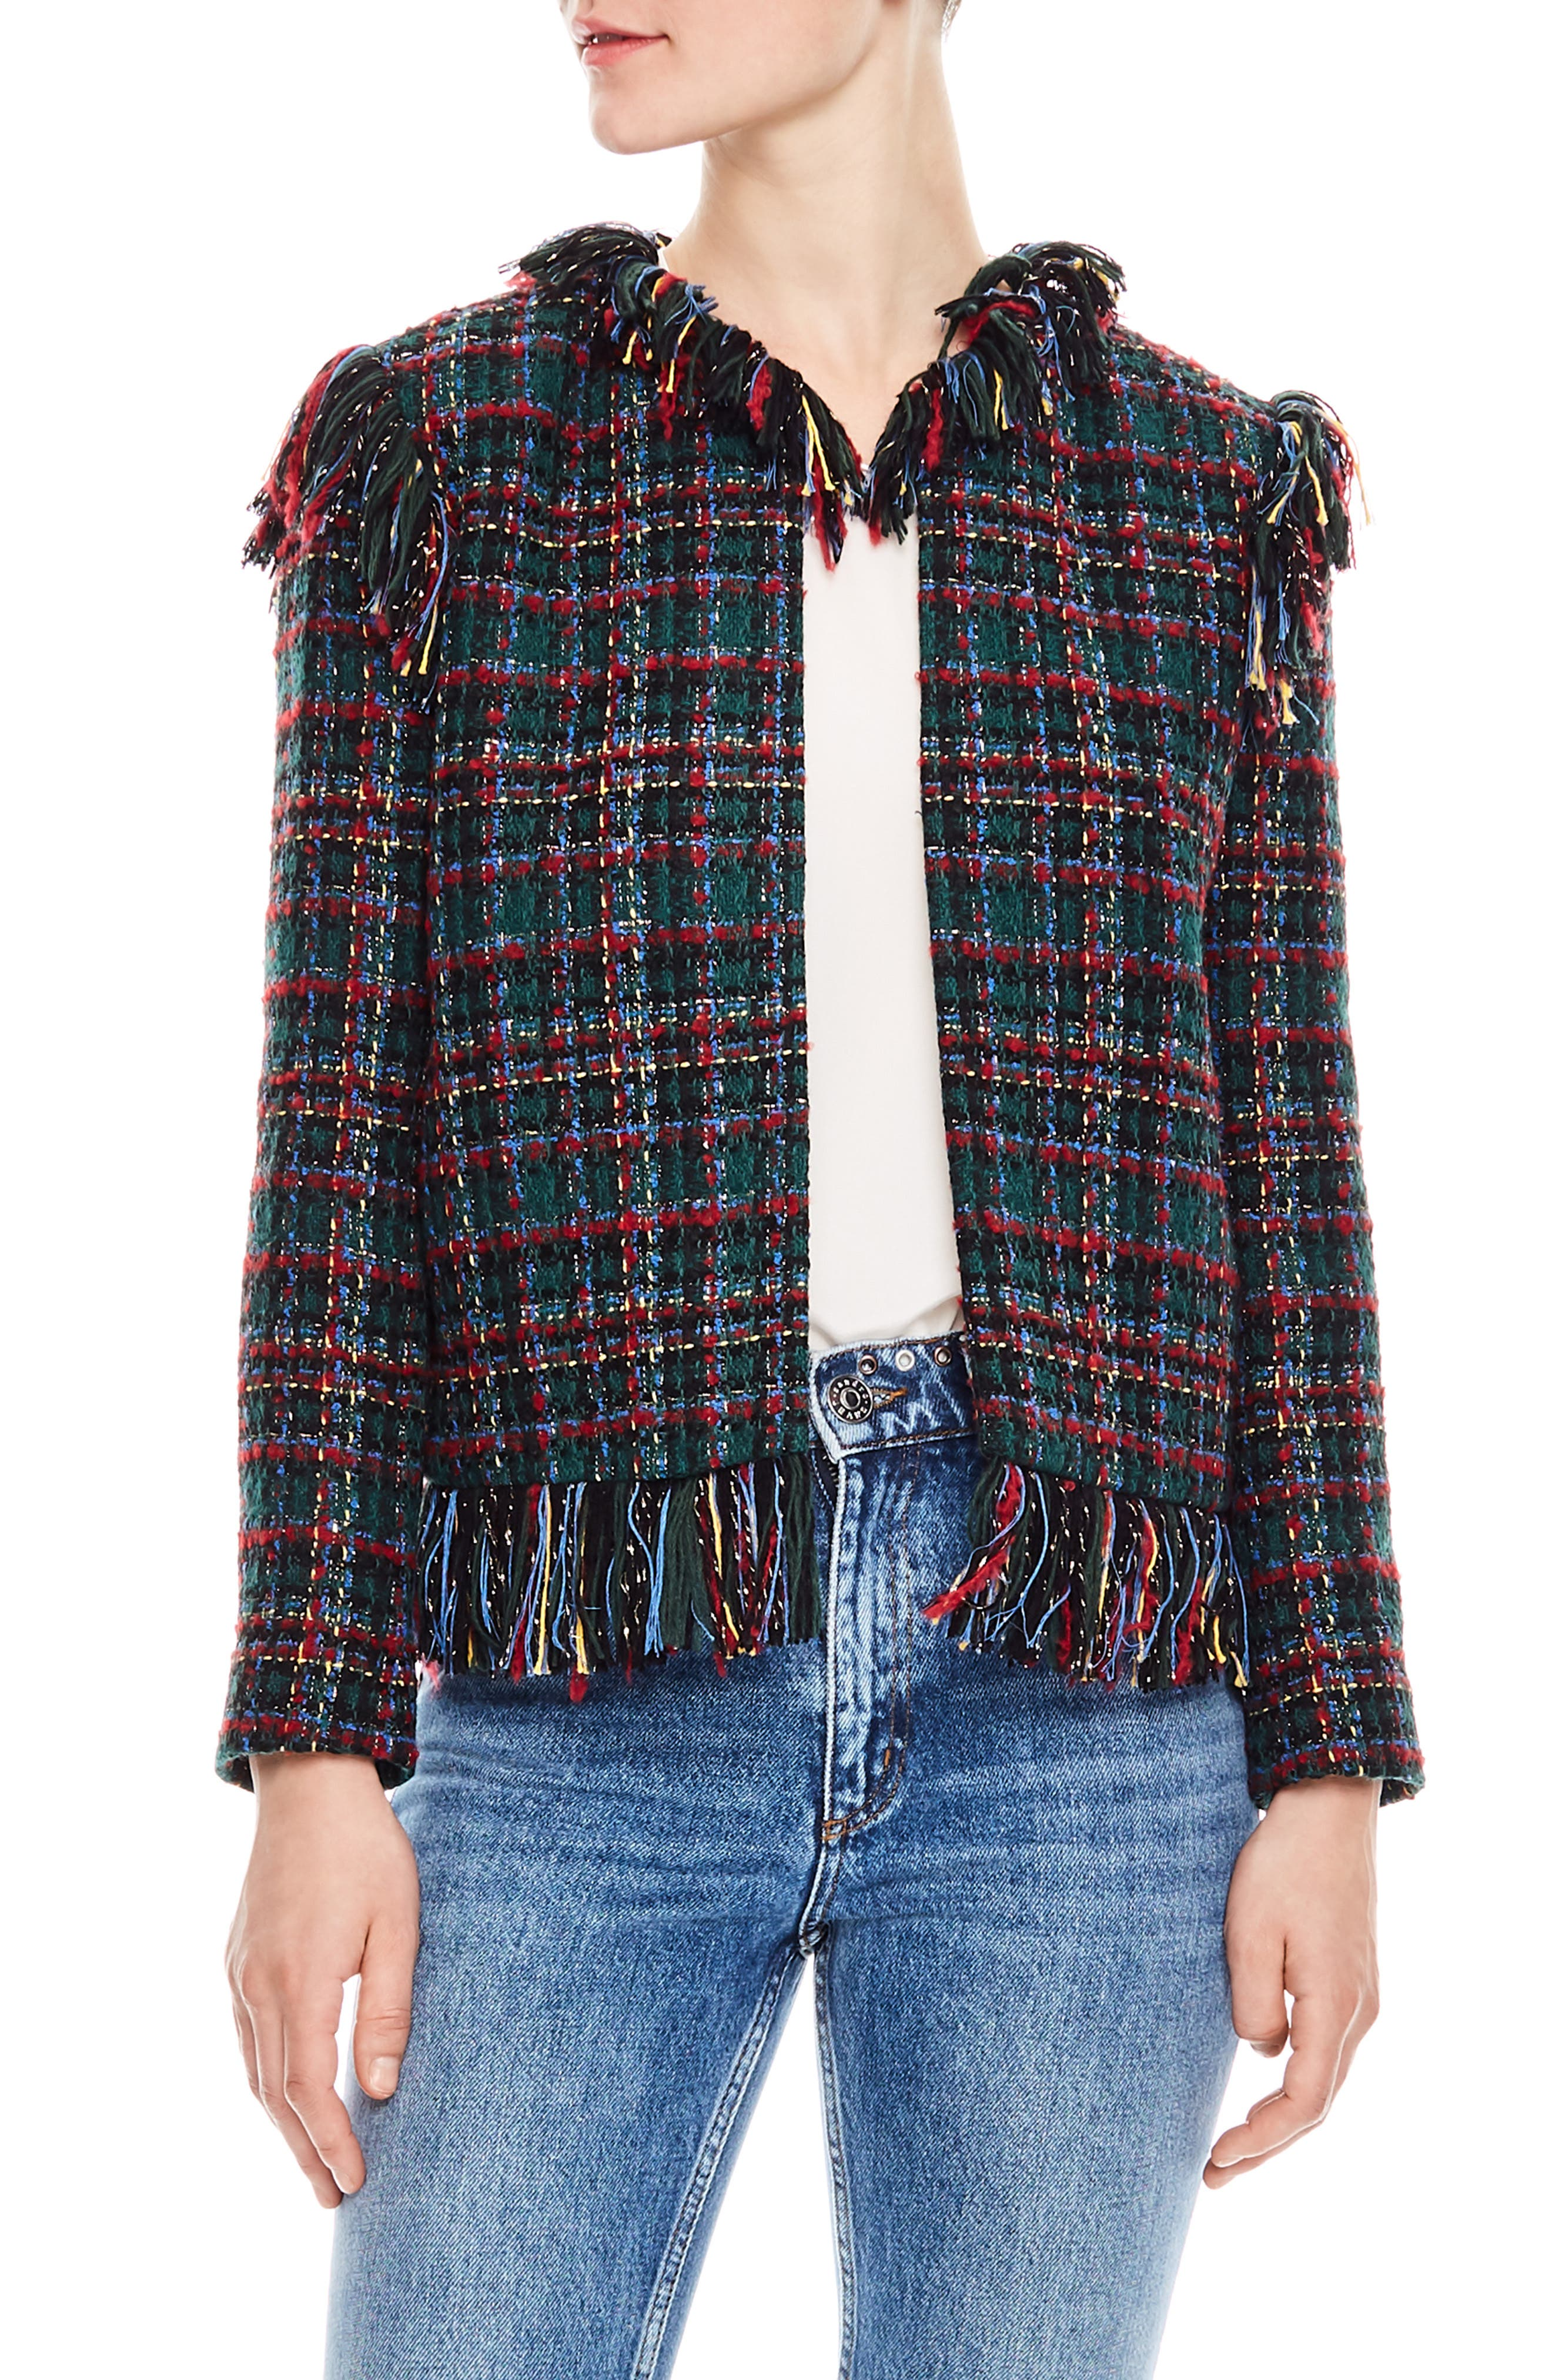 Pumba Plaid Tweed Jacket,                             Main thumbnail 1, color,                             MULTI-COLOR